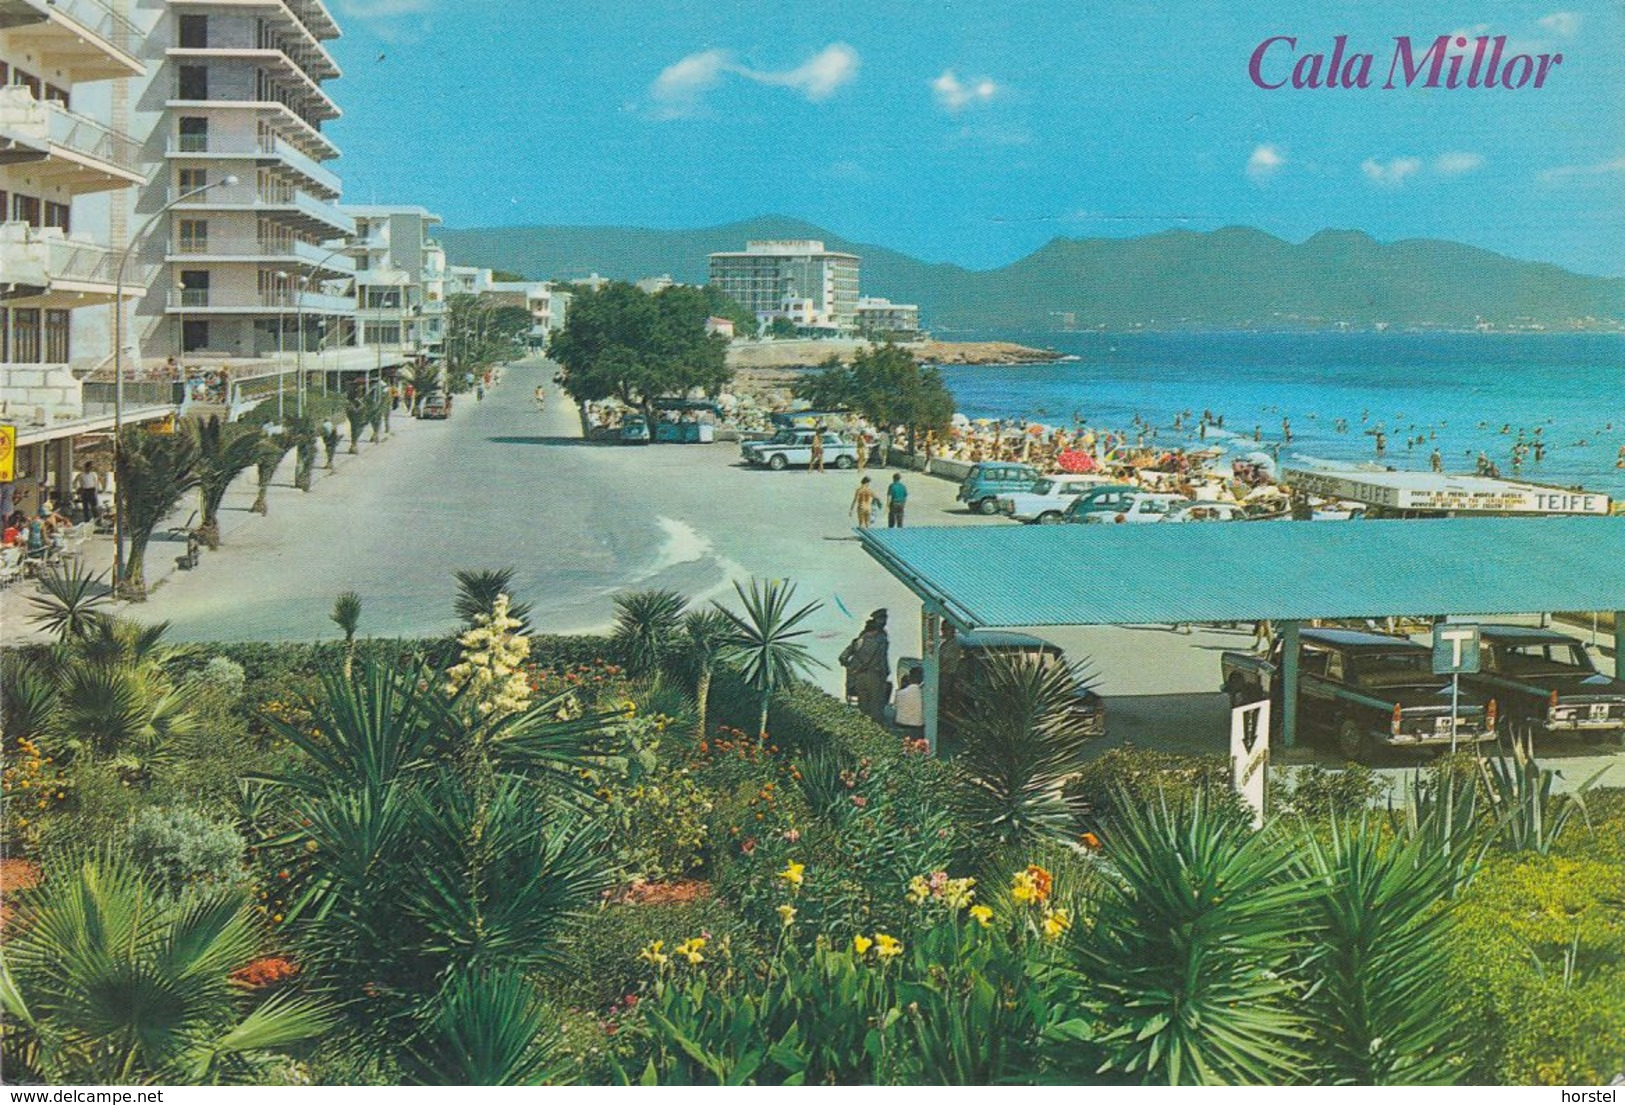 Spanien - Mallorca - Cala Millor - Hotel - Promenade - Cars - Mallorca